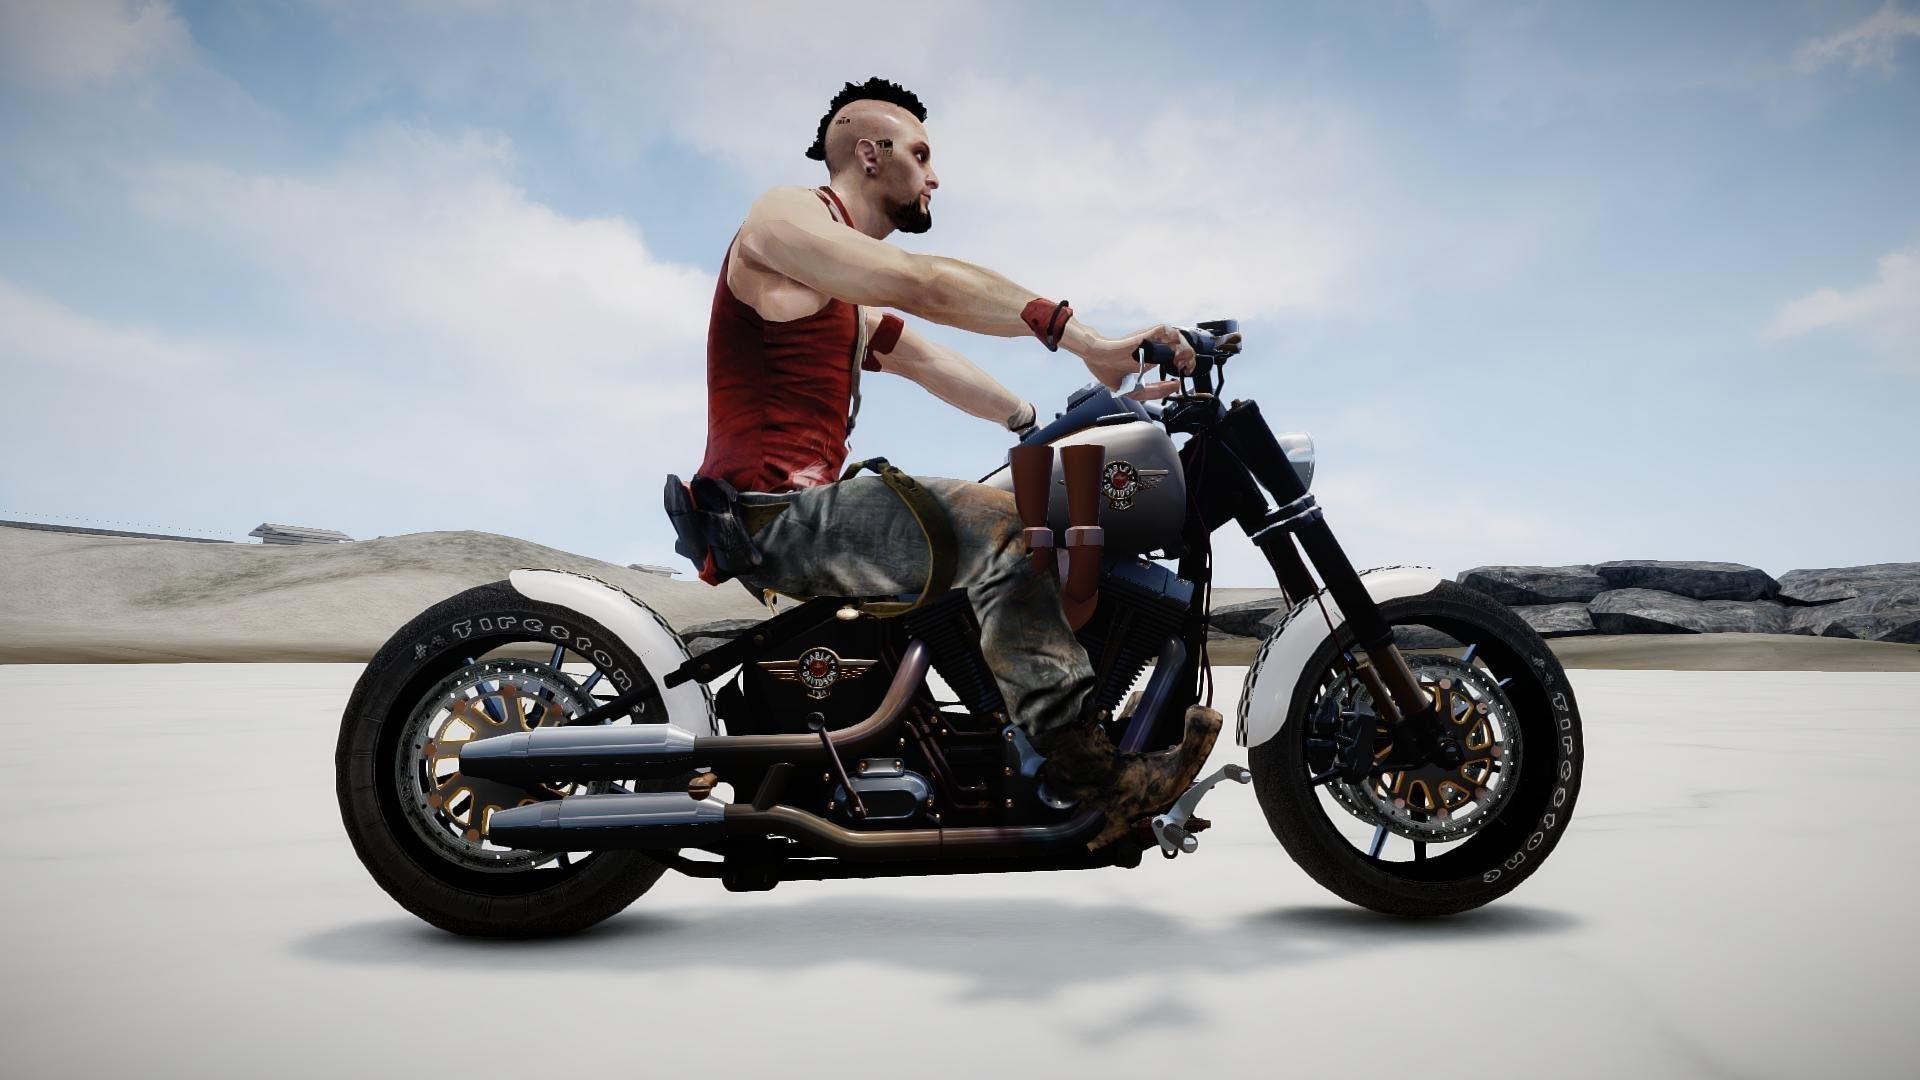 Bobber Motorcycle Wallpaper (62+ images)